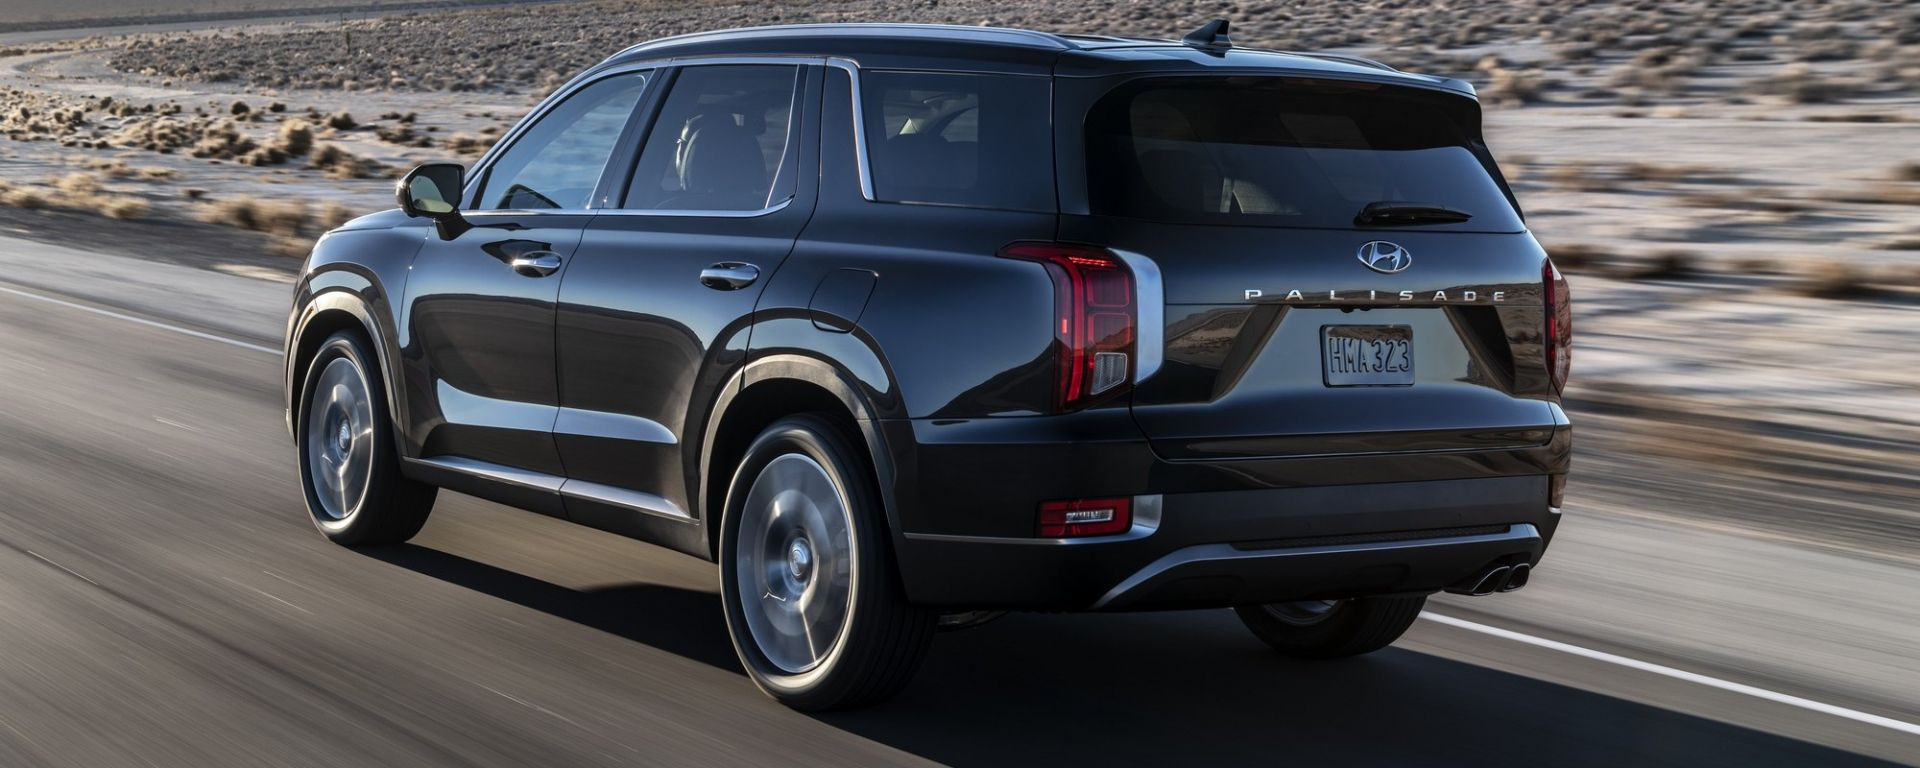 Hyundai Palisade: il Suv a 8 posti debutta a Los Angeles